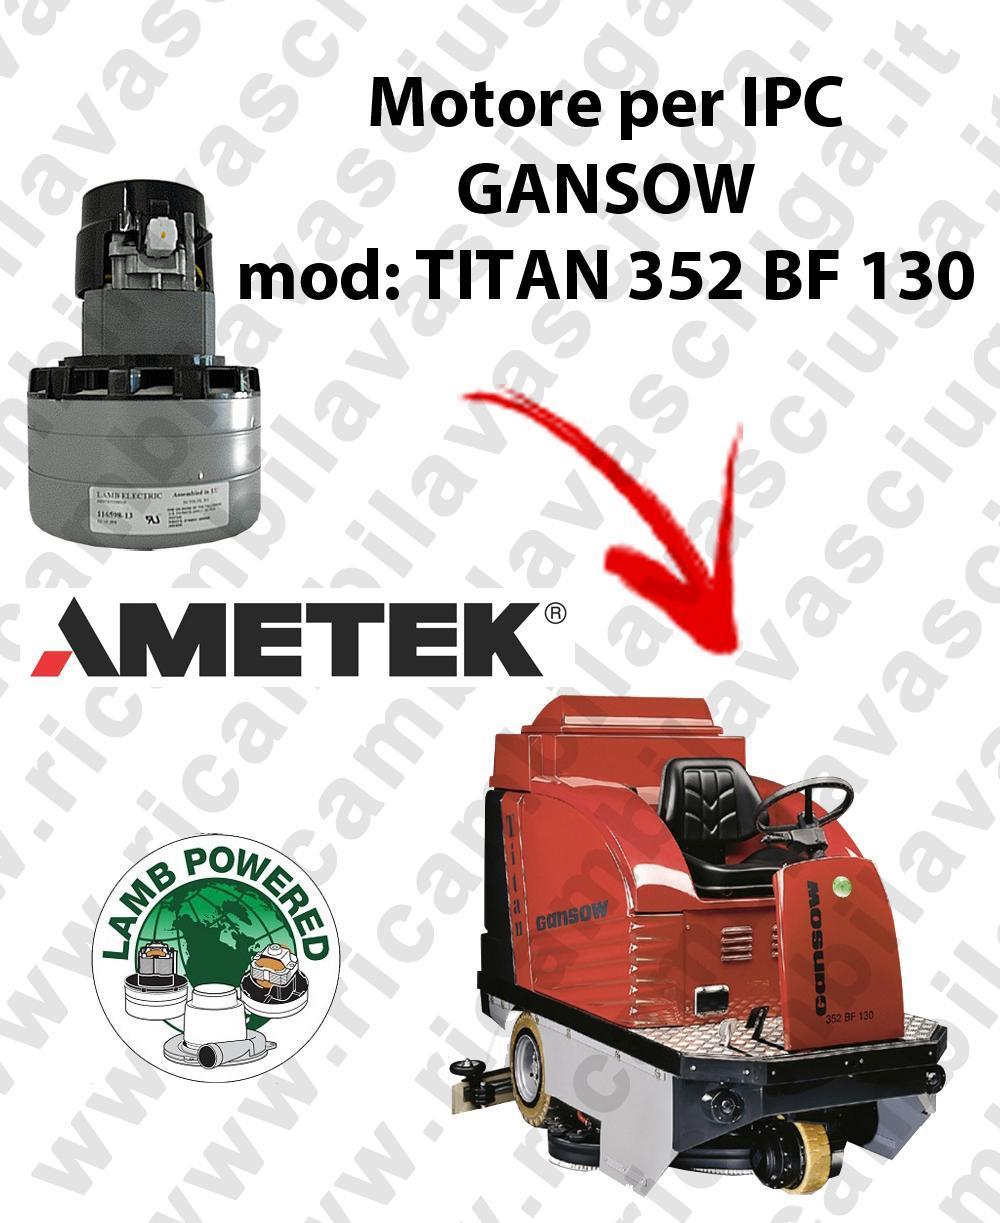 TITAN 352 BF 130 Motore de apiracion GANSOW